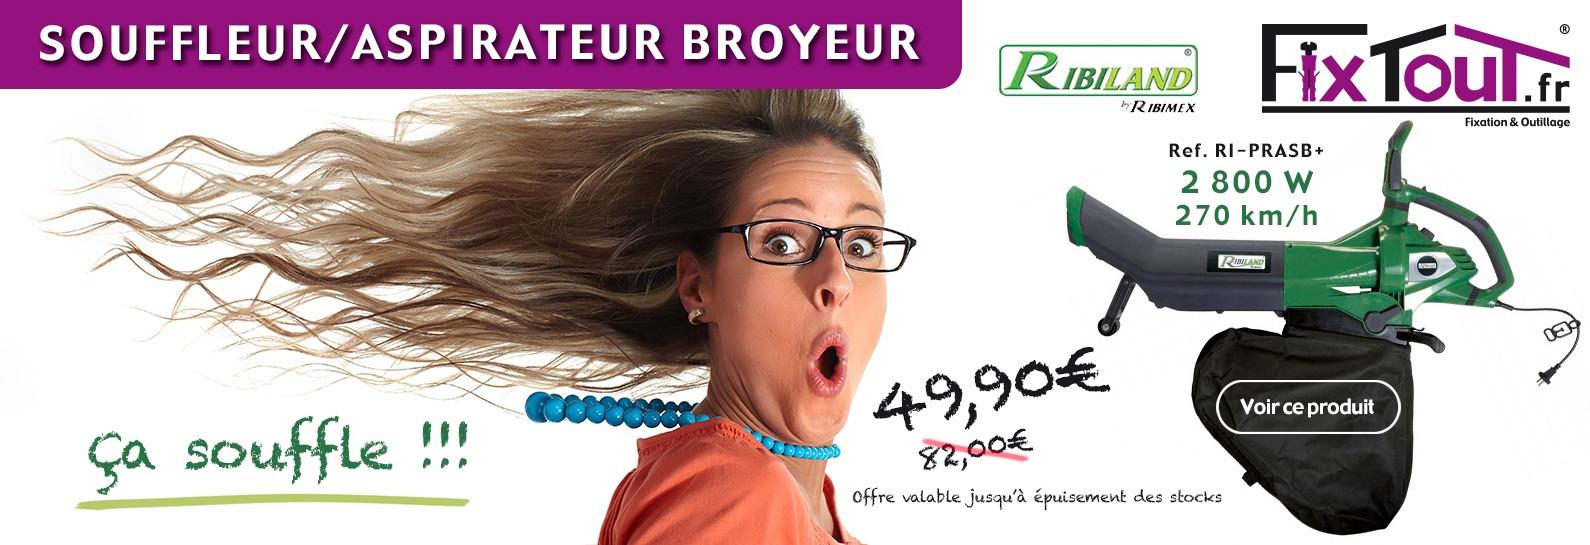 Souffleur / Aspirateur broyeur